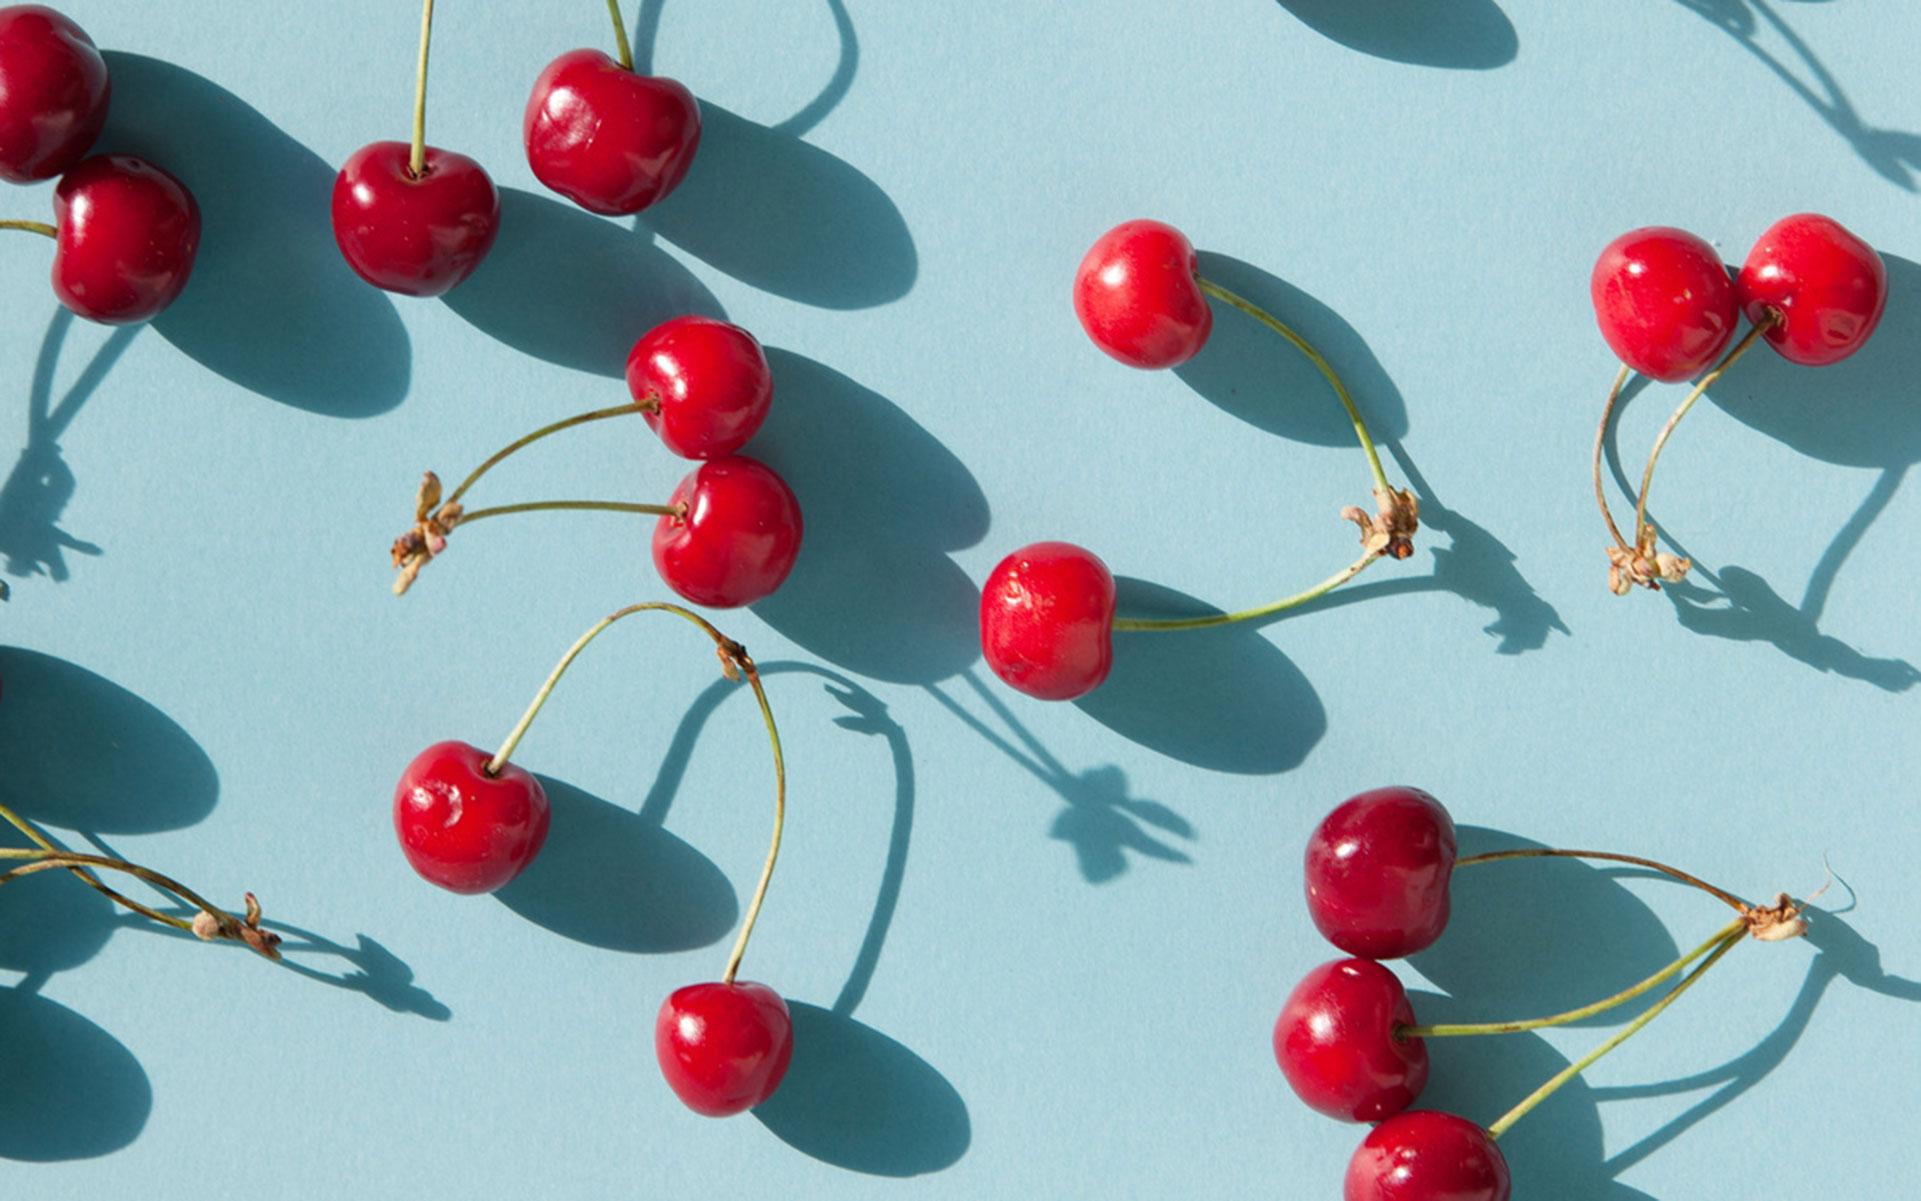 marijuana strains that taste like cherries